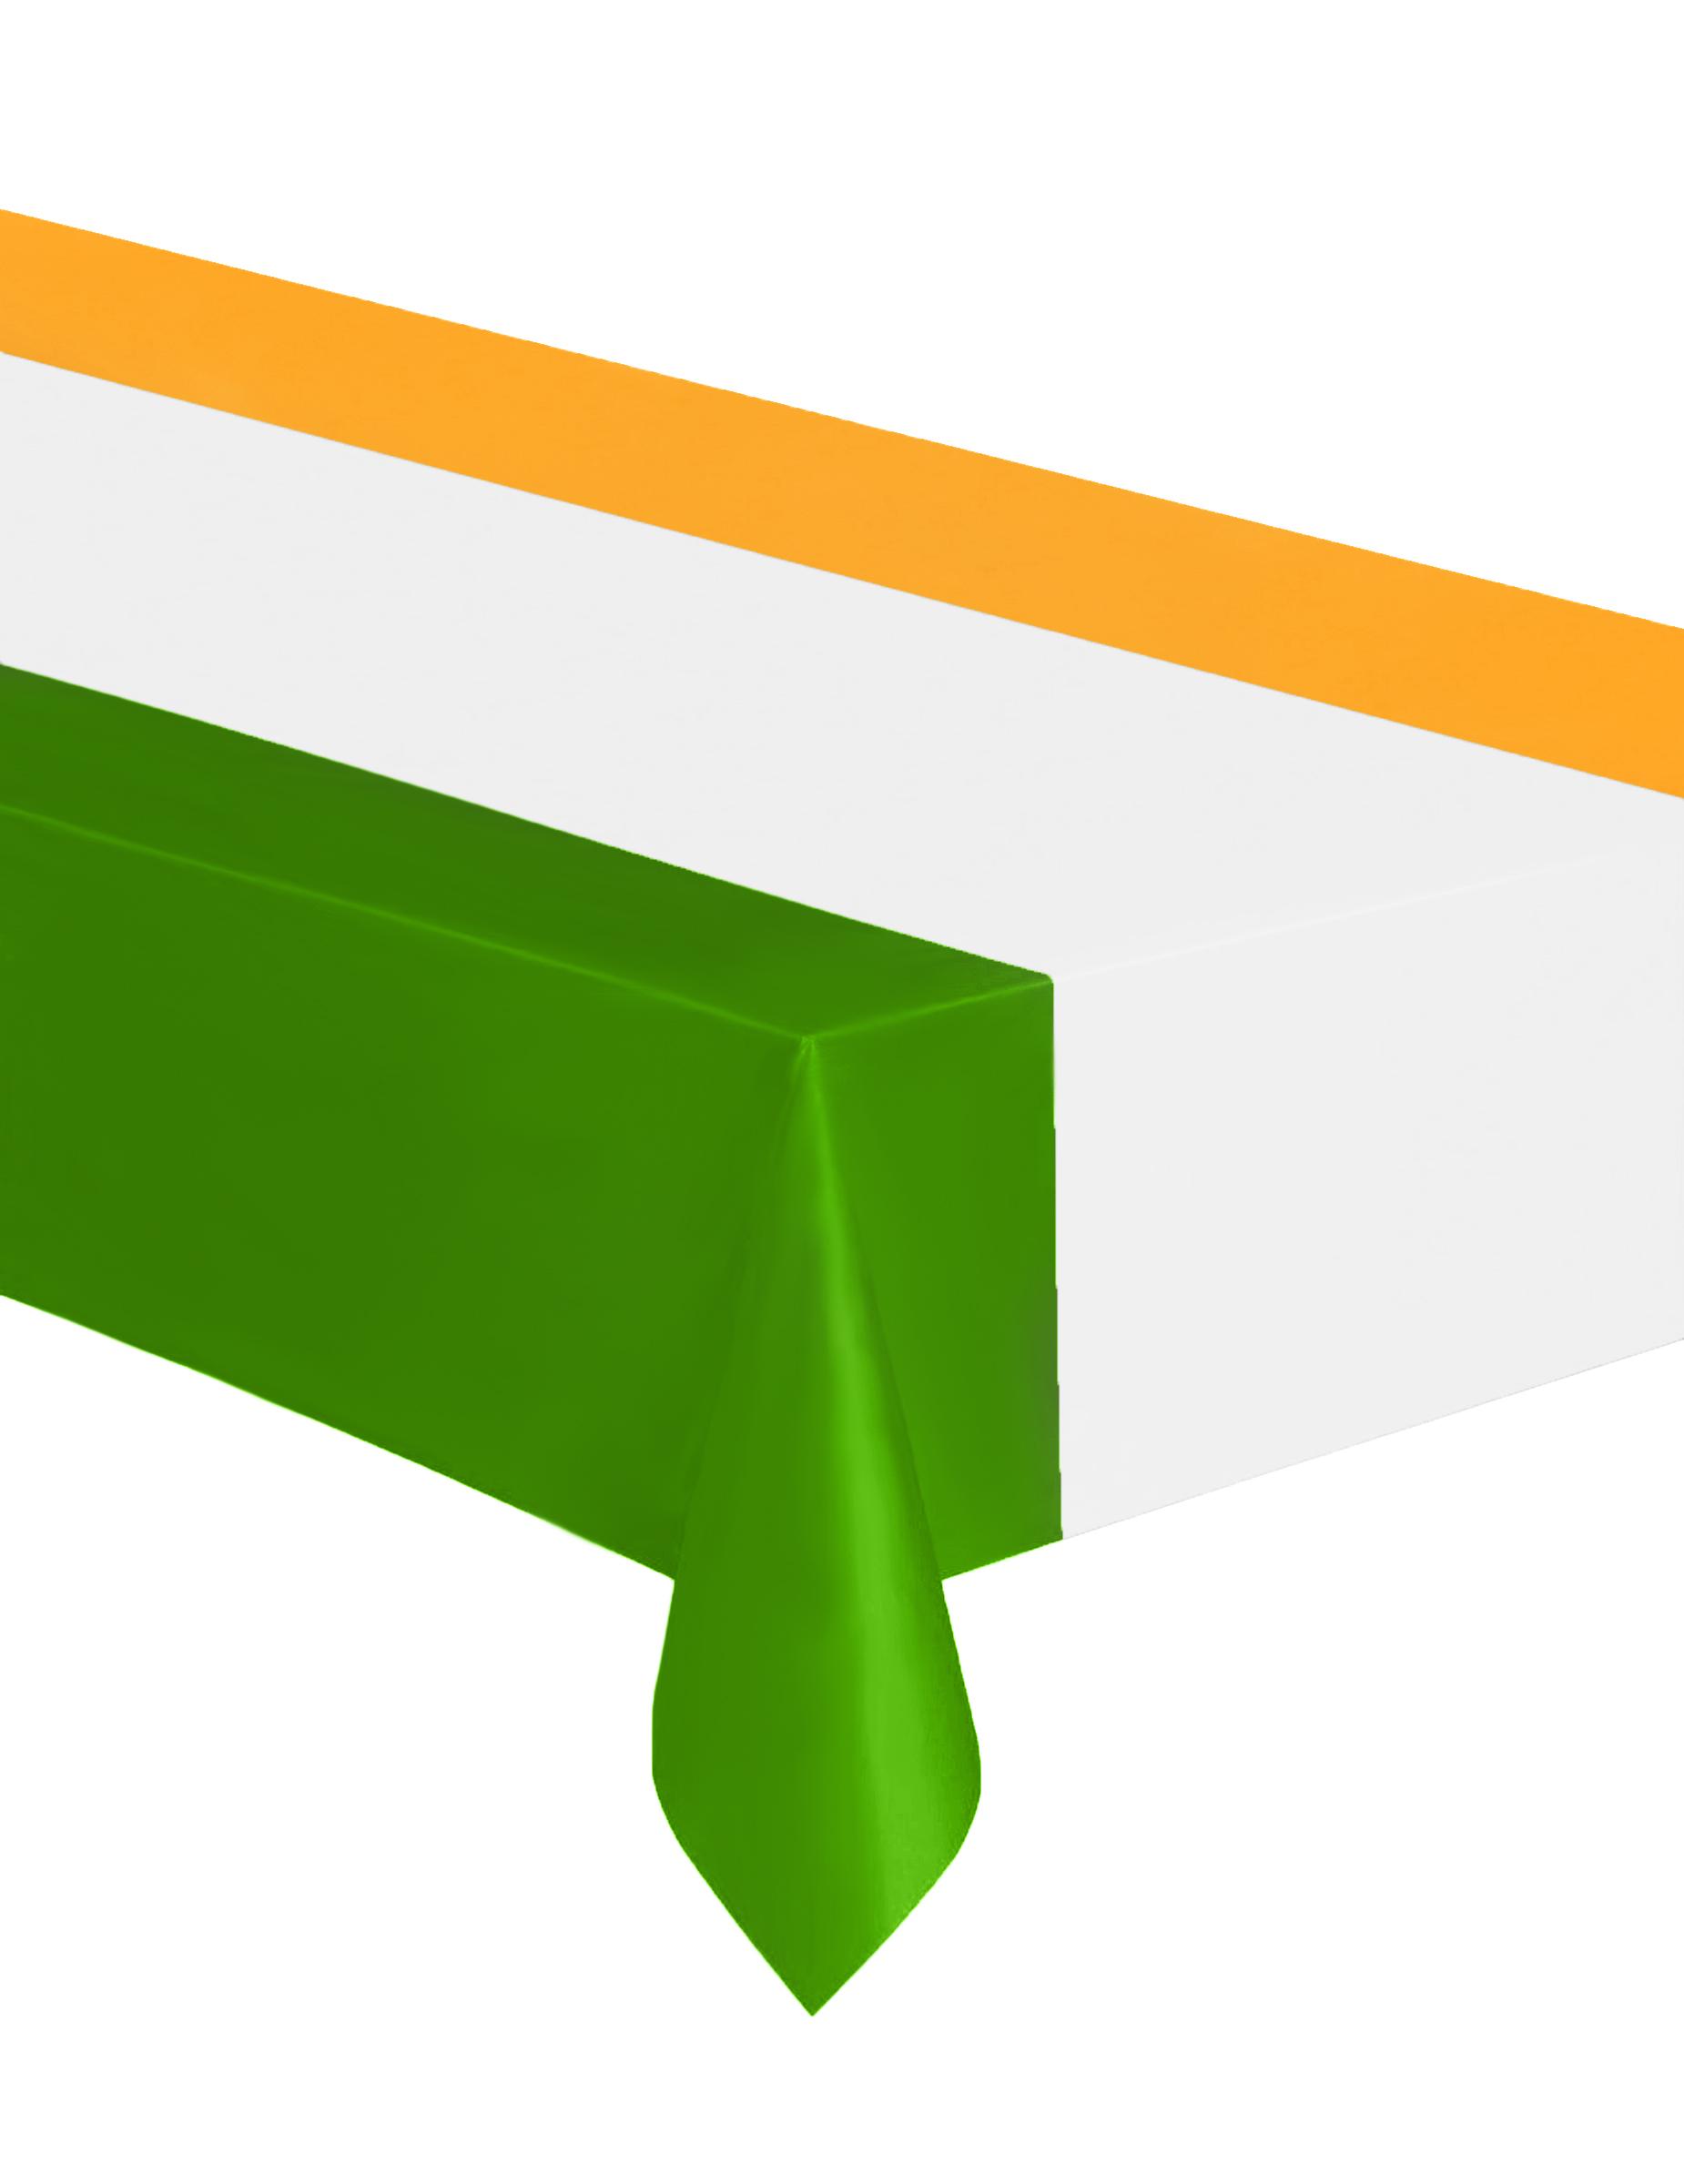 nappe plastique st patrick irlande deguise toi achat de decoration animation. Black Bedroom Furniture Sets. Home Design Ideas